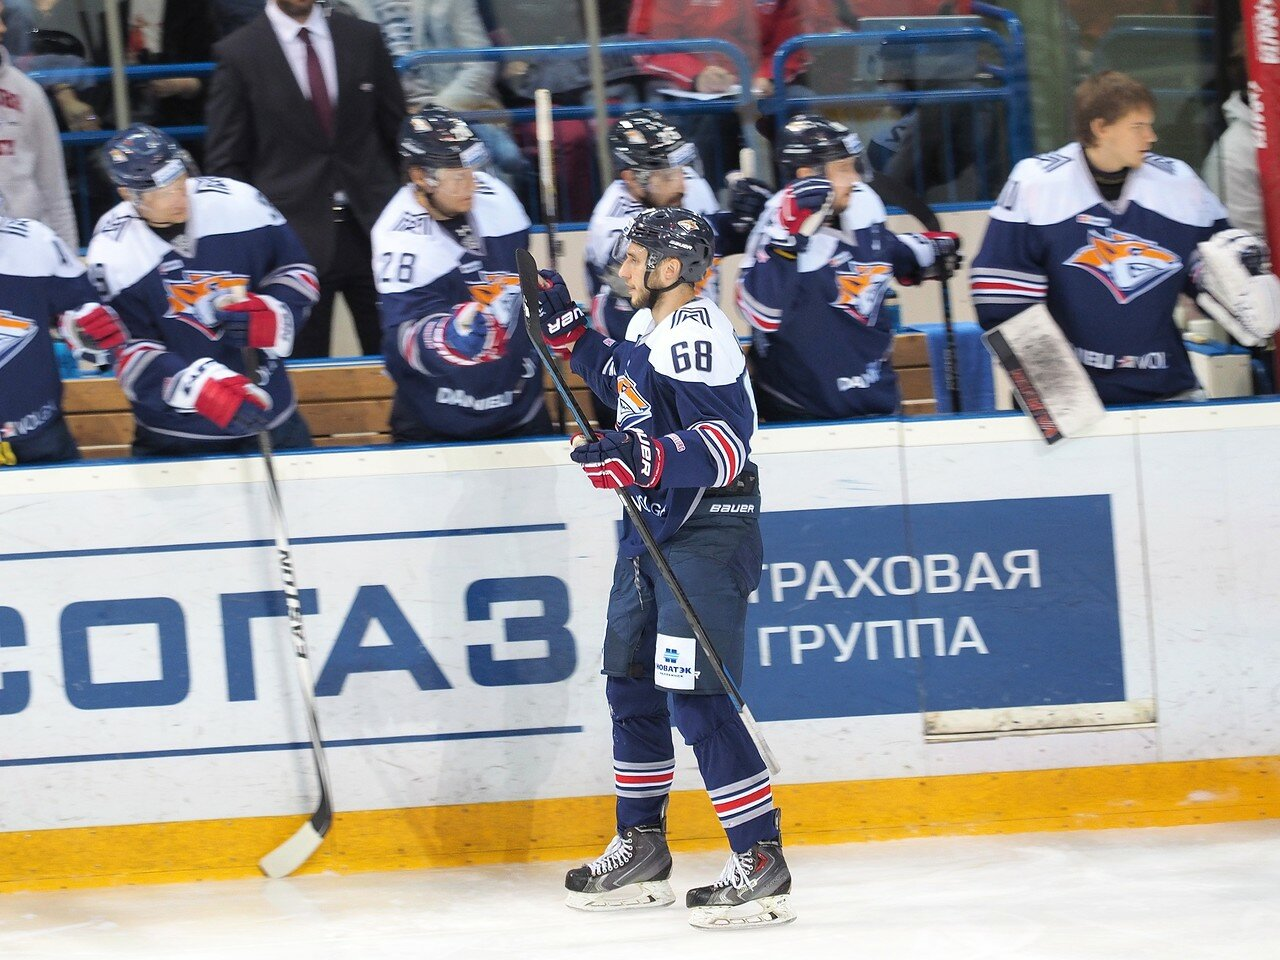 15Плей-офф 2016 Восток Финал Металлург - Салават Юлаев 25.03.2016